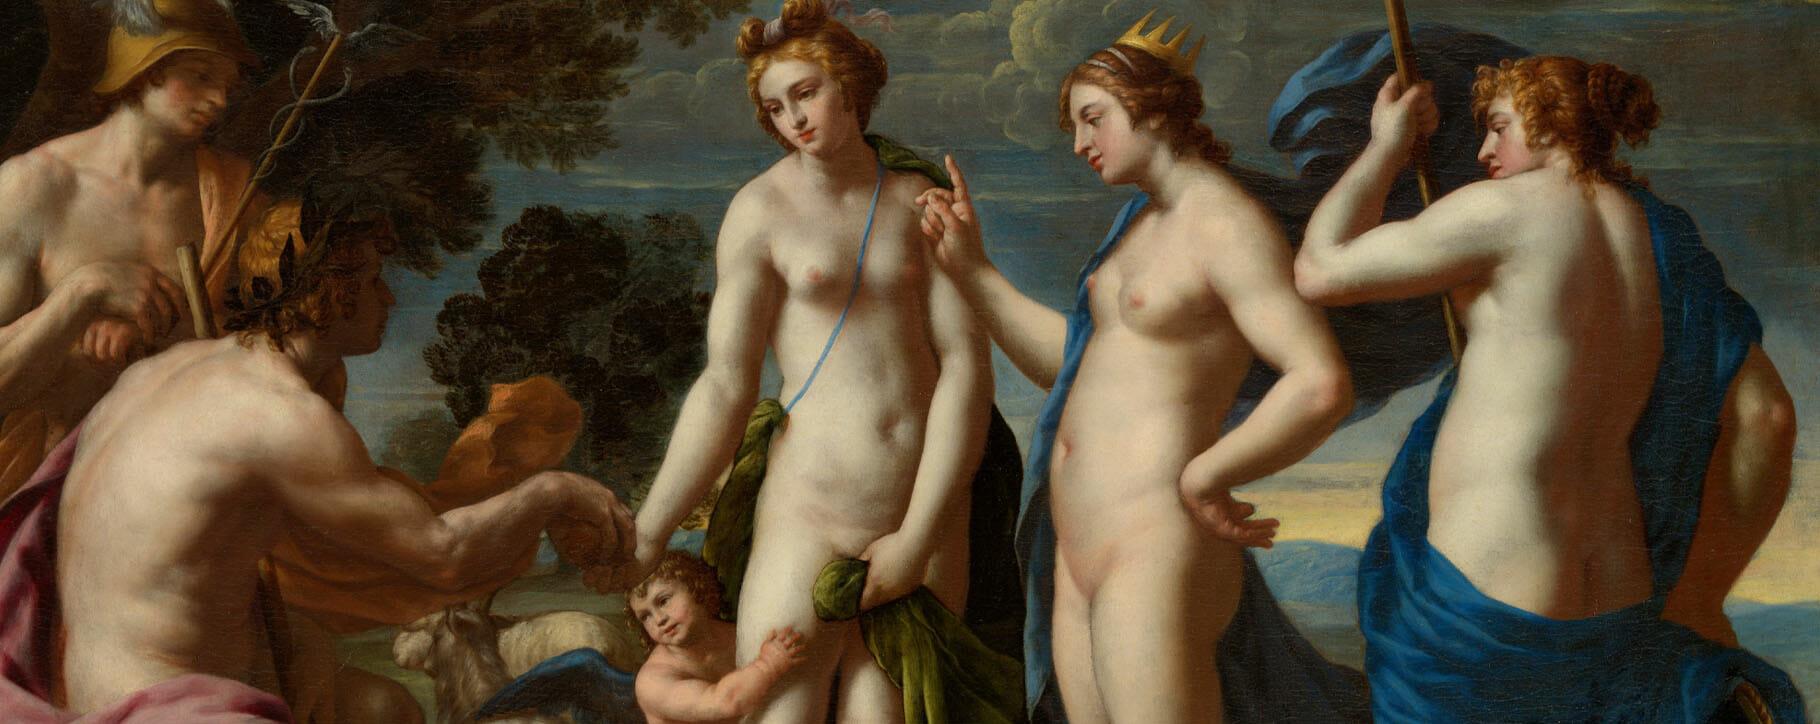 The Judgement Of Paris classical painting